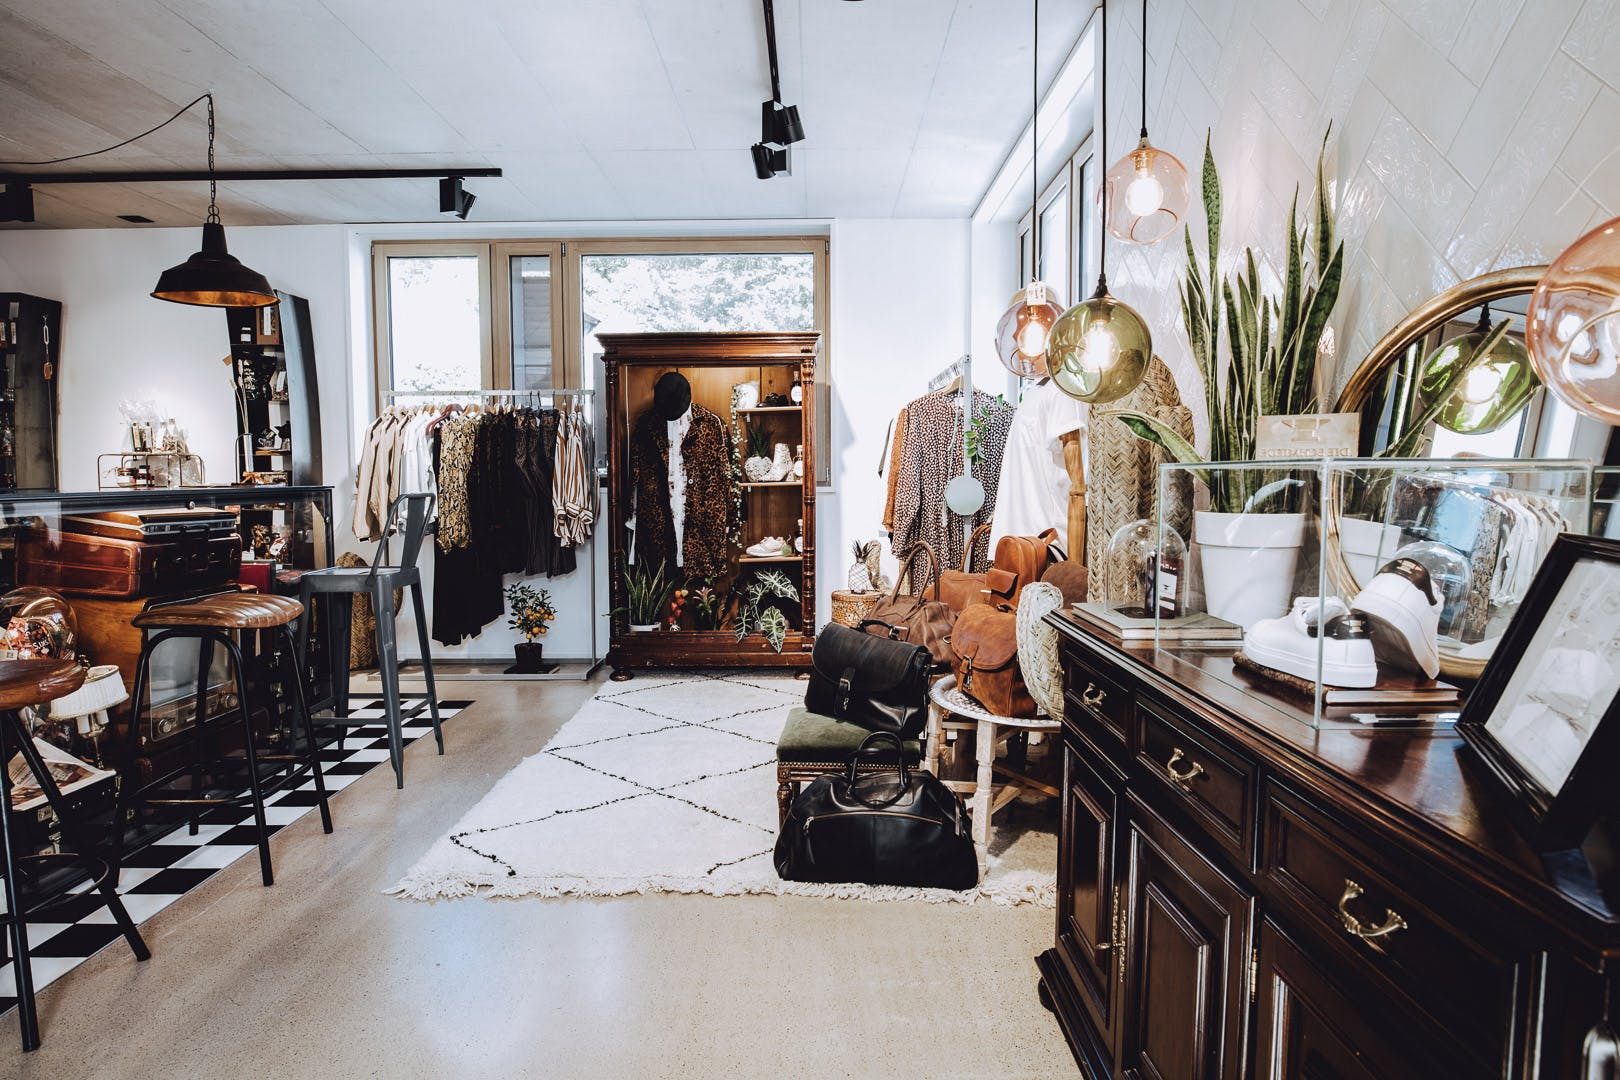 Eingang der Konzept-Boutique